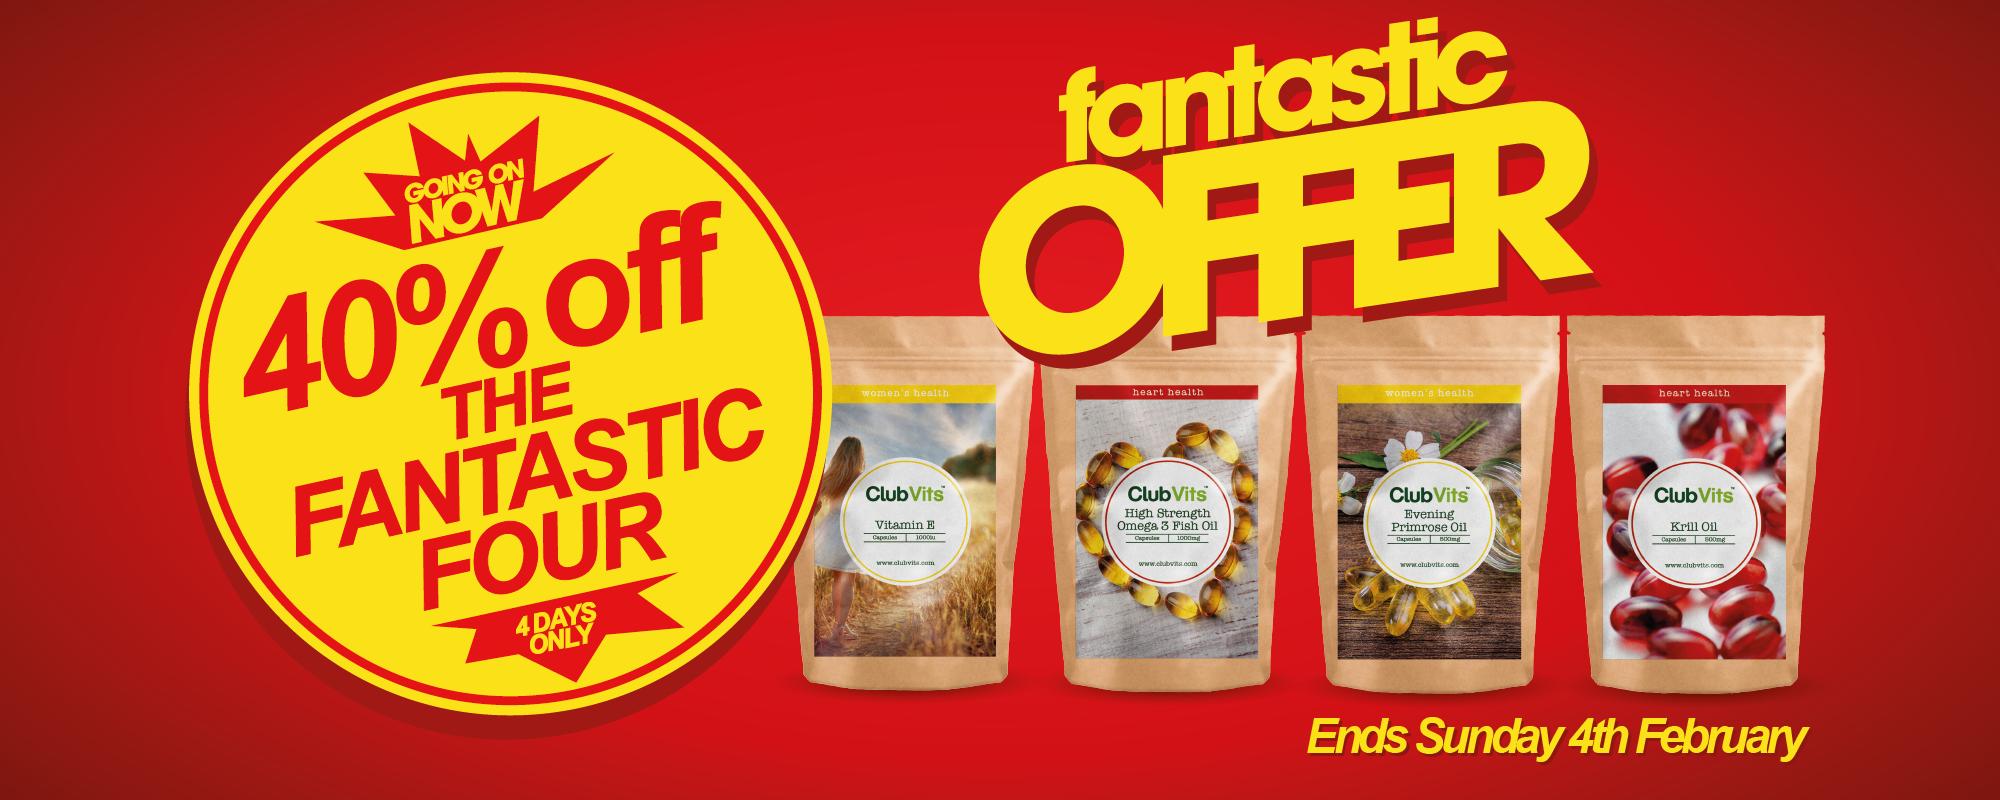 ca1194ef7345 Fantastic Four 40% Off Sale